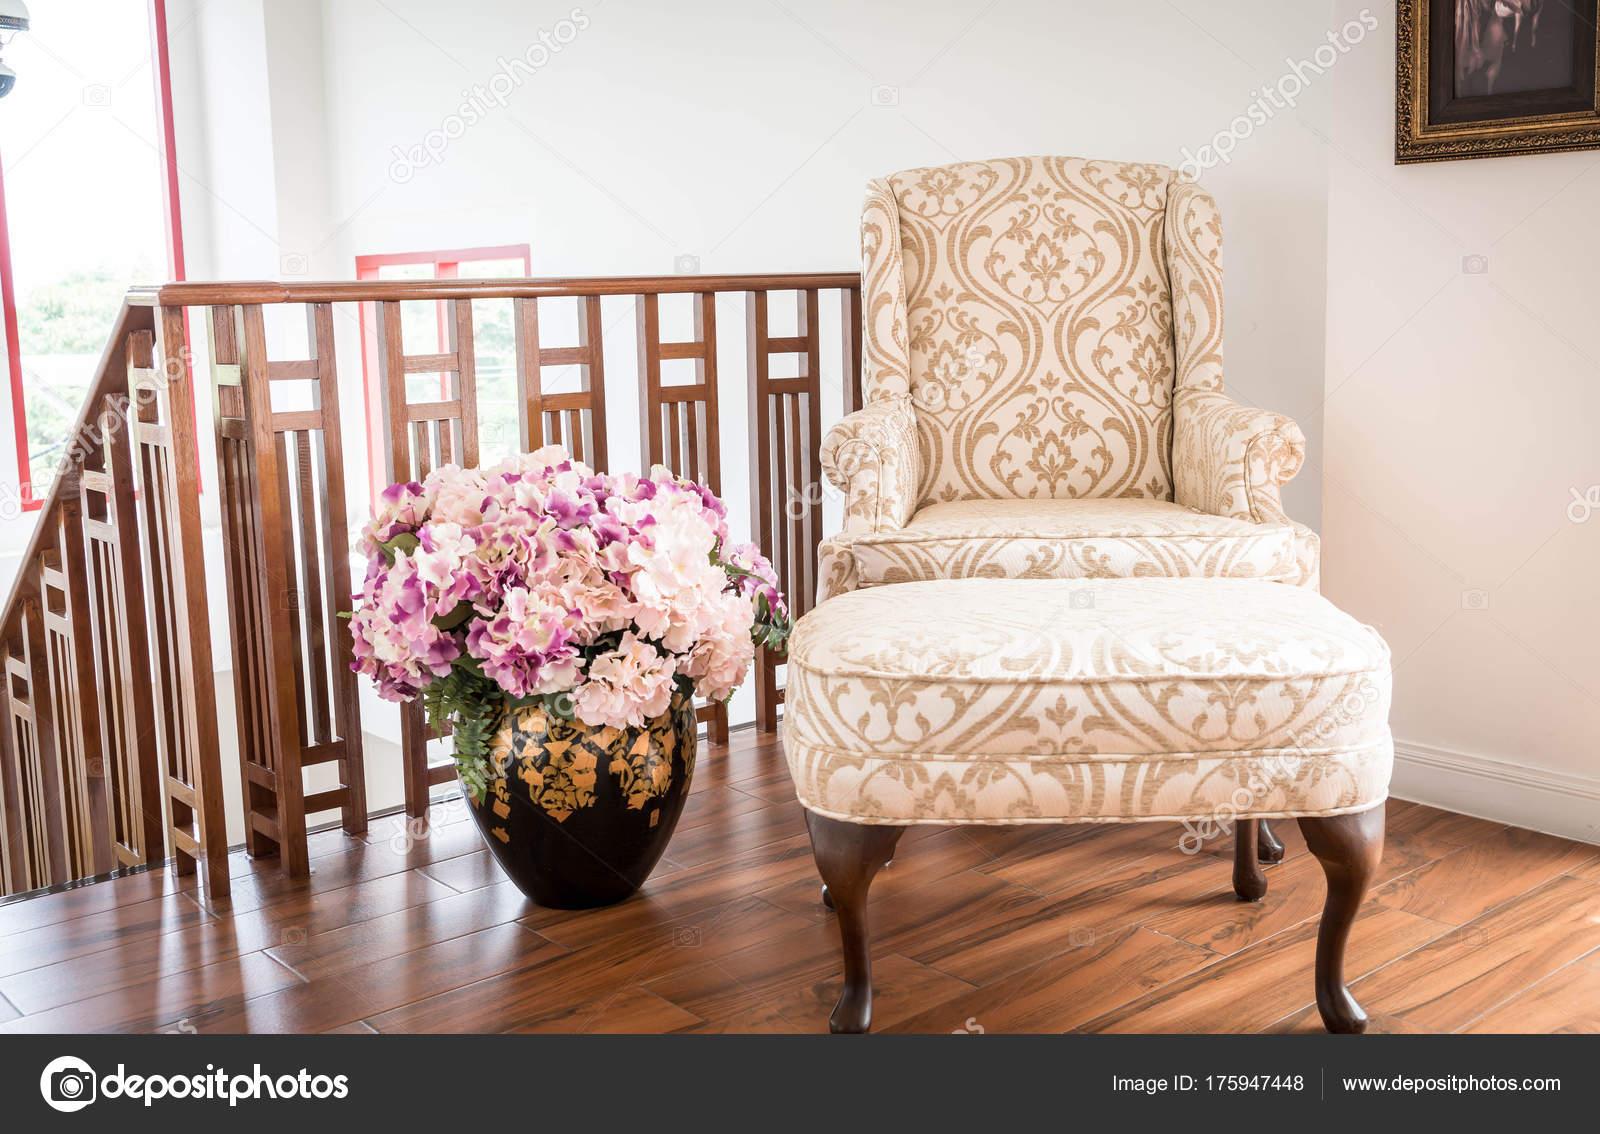 Oude fauteuil decoratie in huis u2014 stockfoto © topntp #175947448